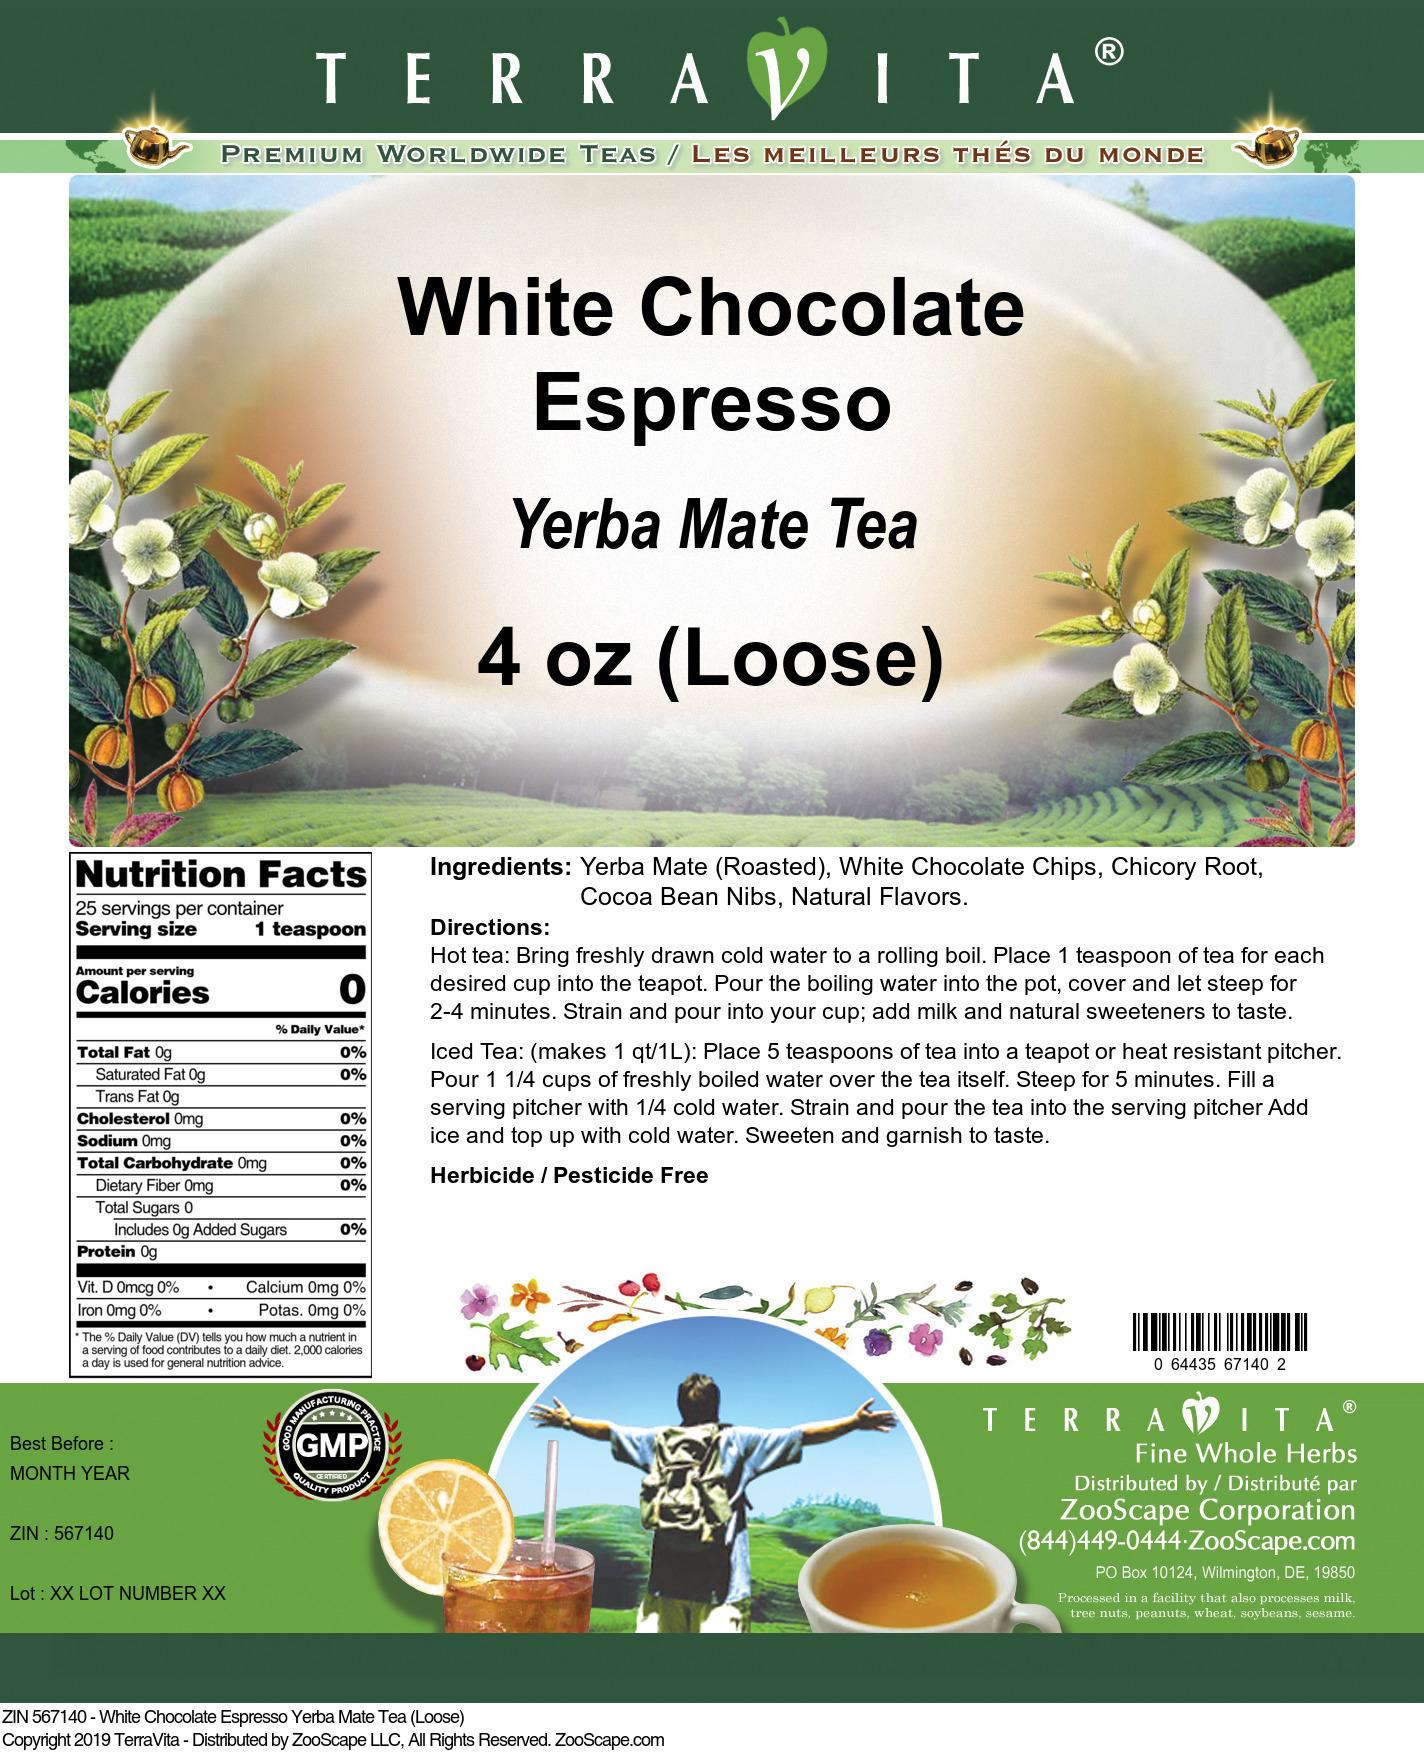 White Chocolate Espresso Yerba Mate Tea (Loose)